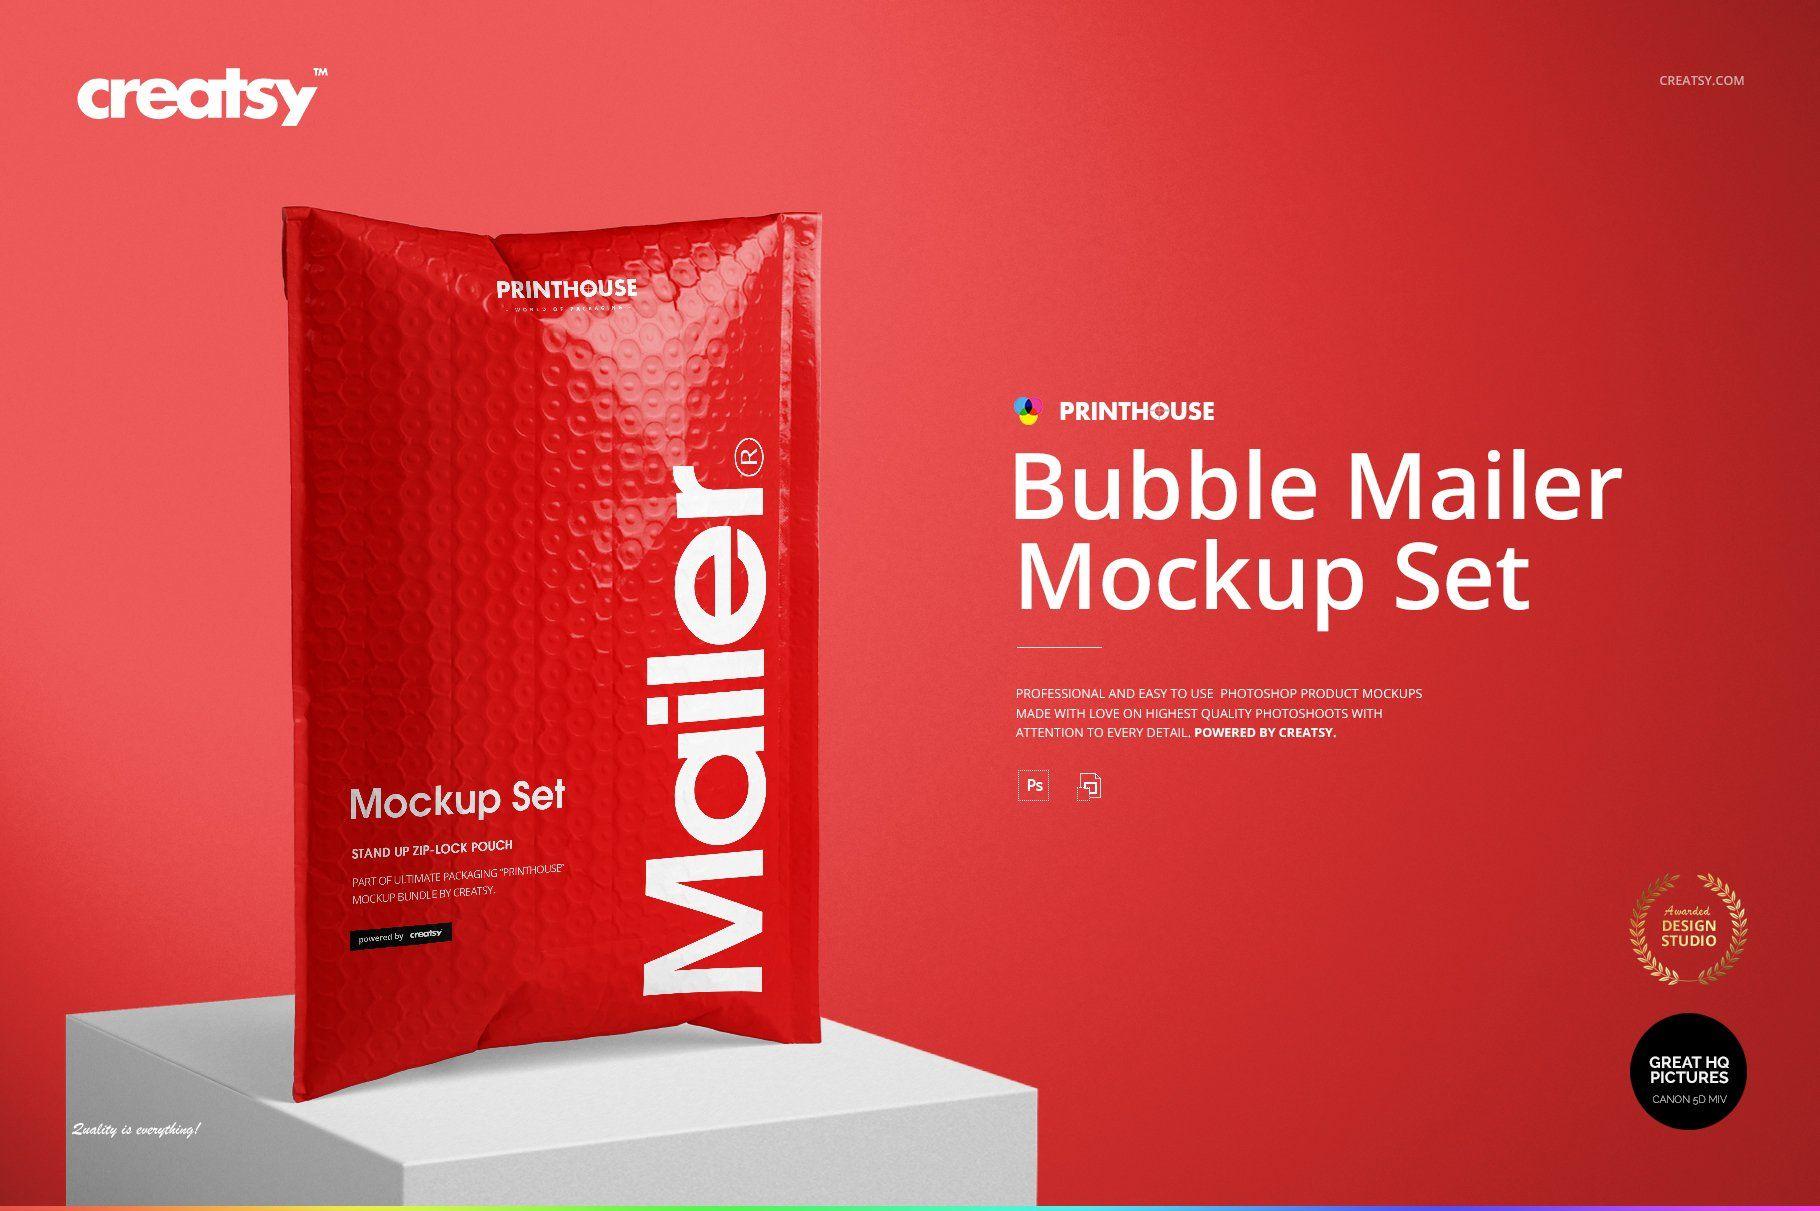 Download Bubble Mailer Mockup Set Book Cover Mockup Mockup Bubbles